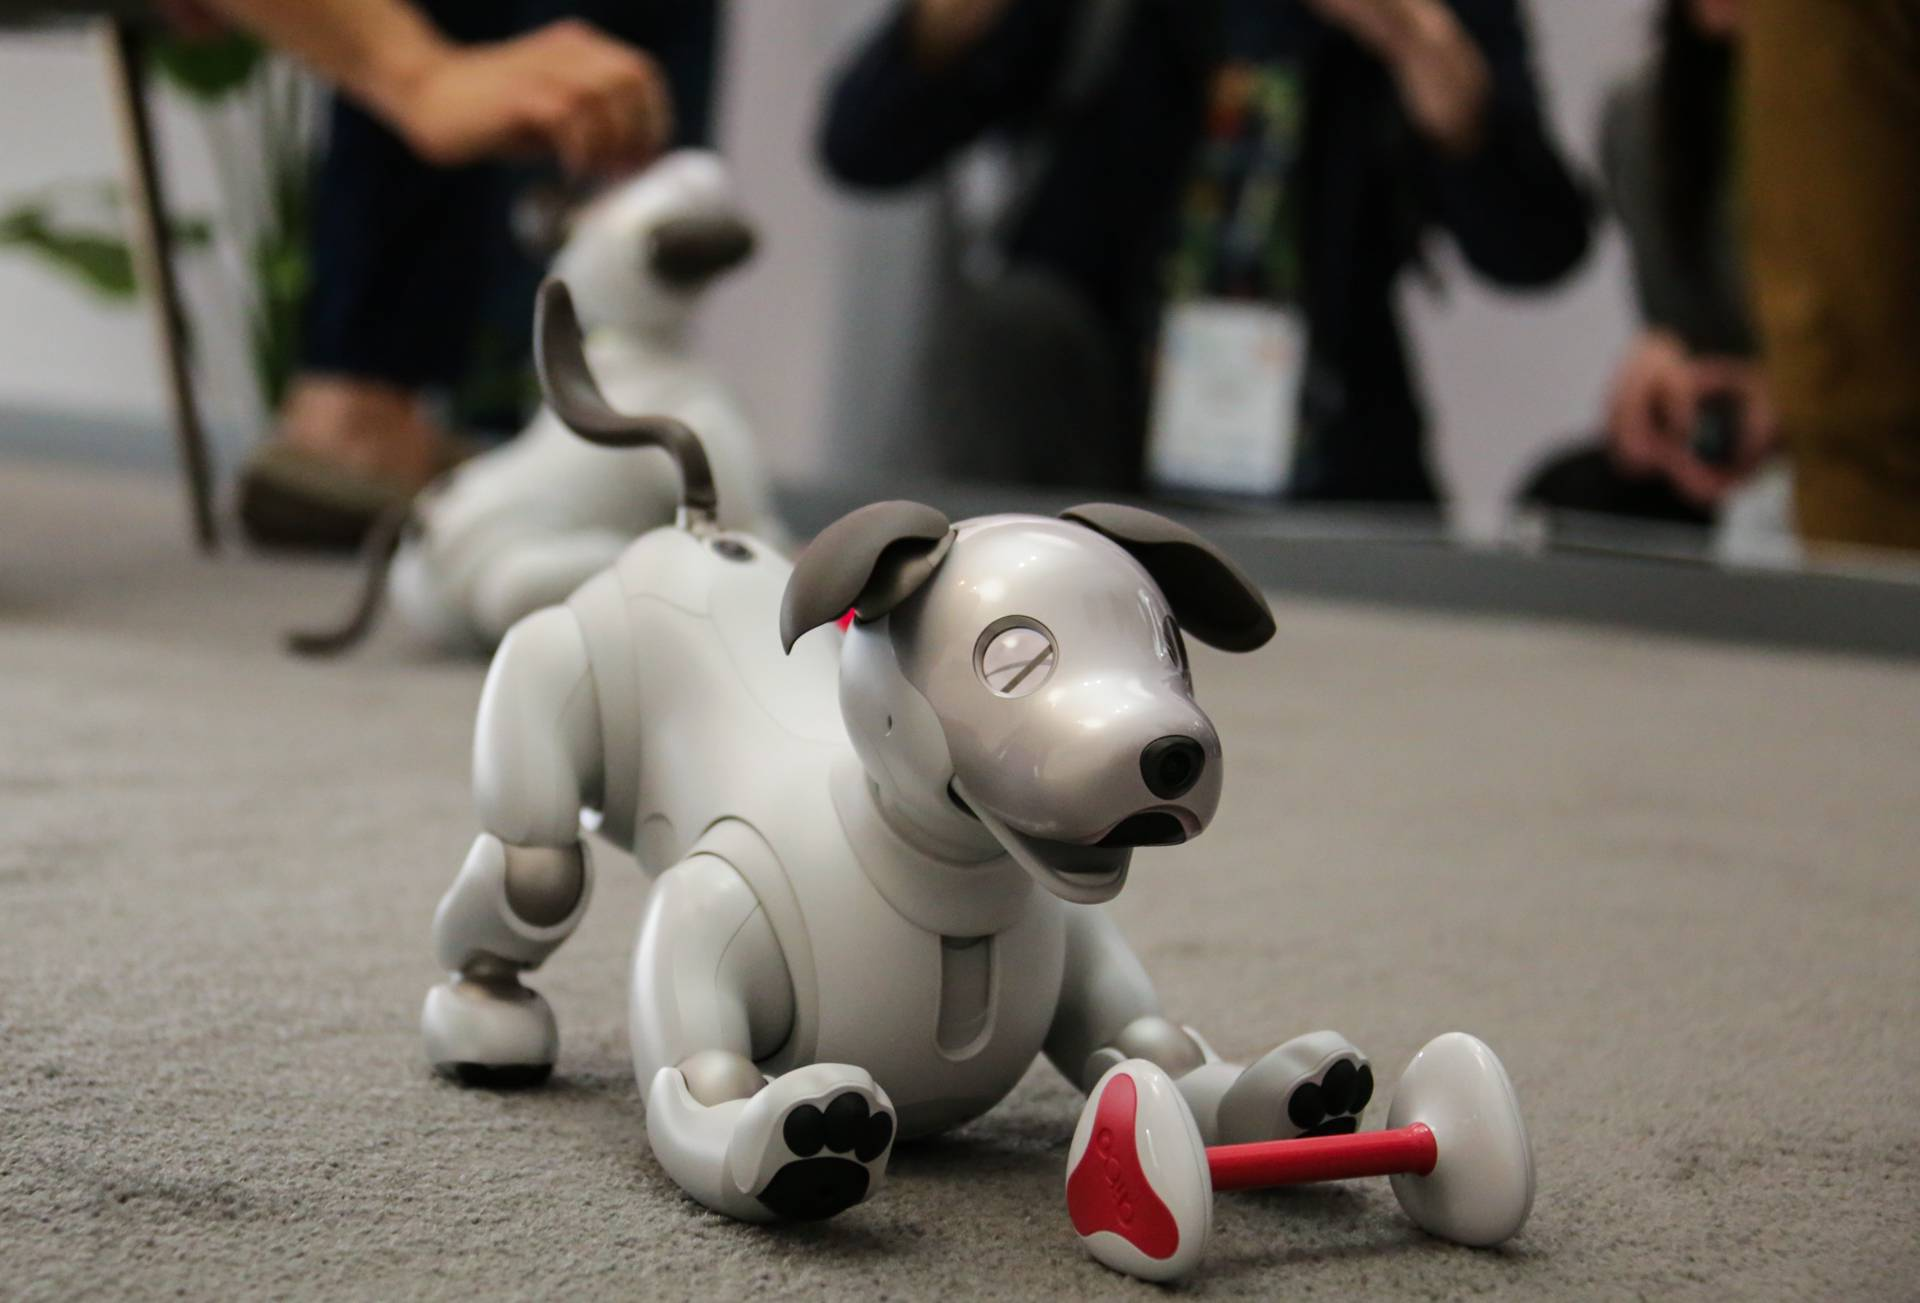 Sony's AIBO robotic dog